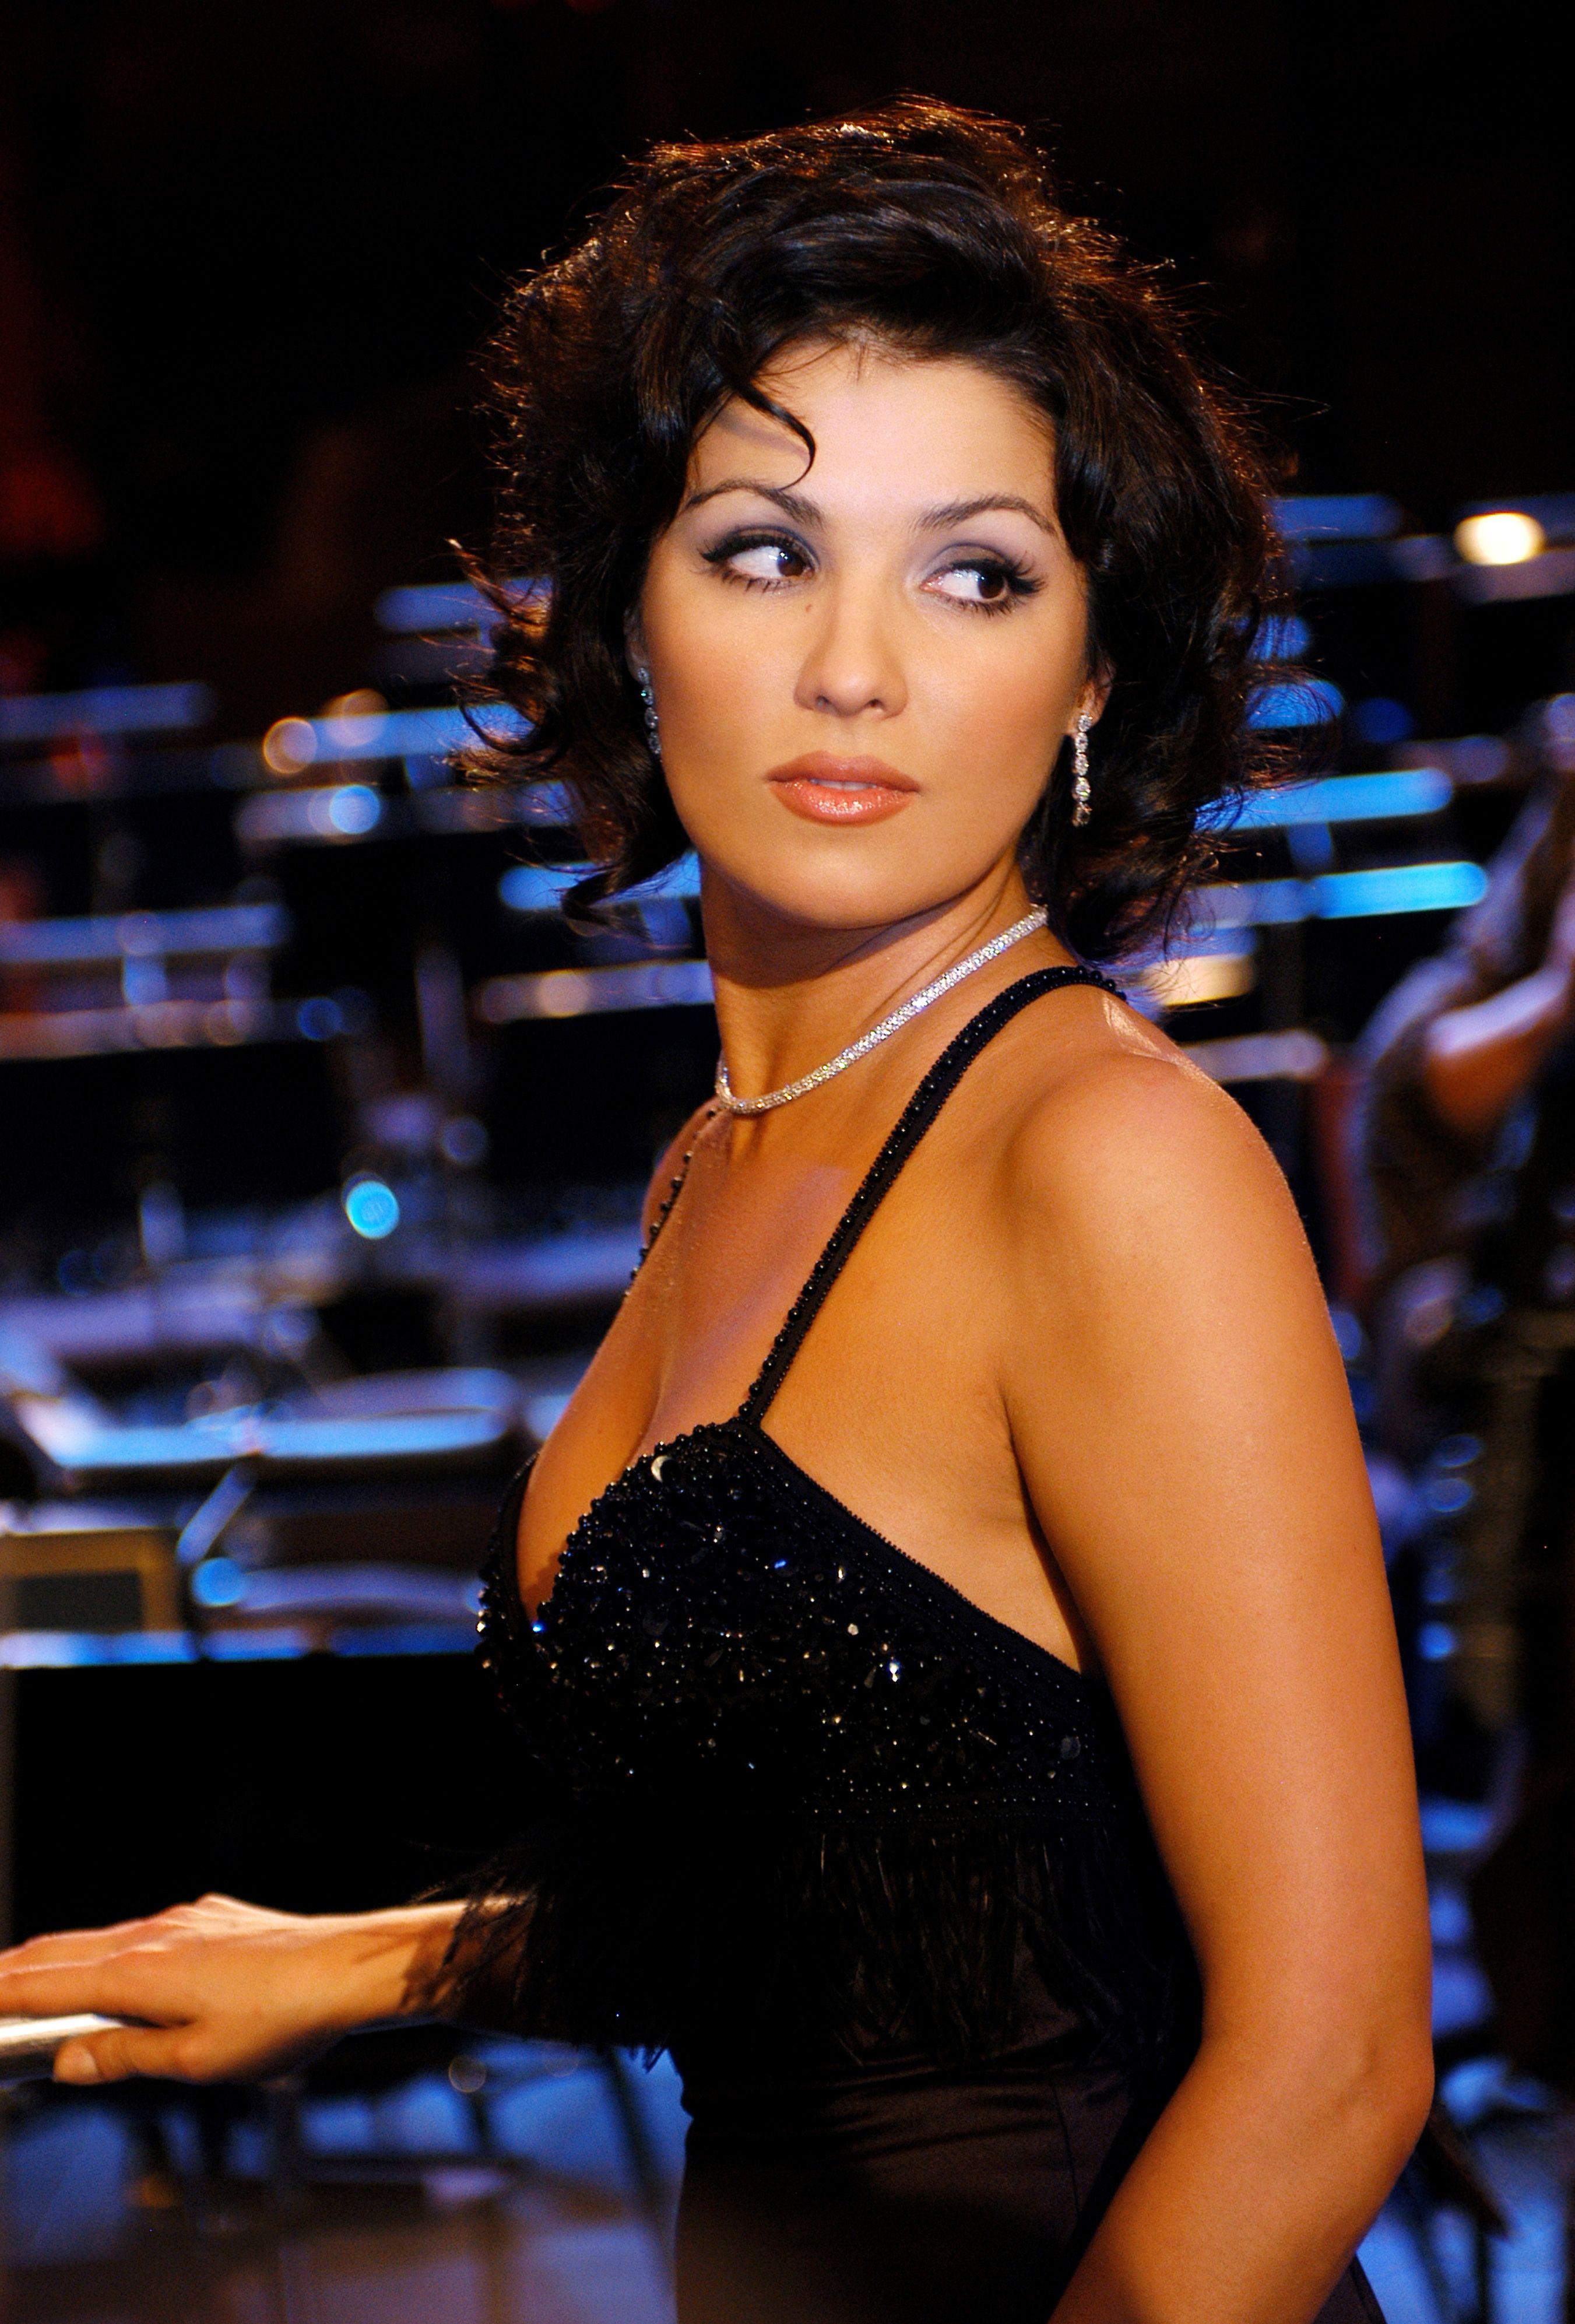 Cantante Opera Singers Sopranos Singer